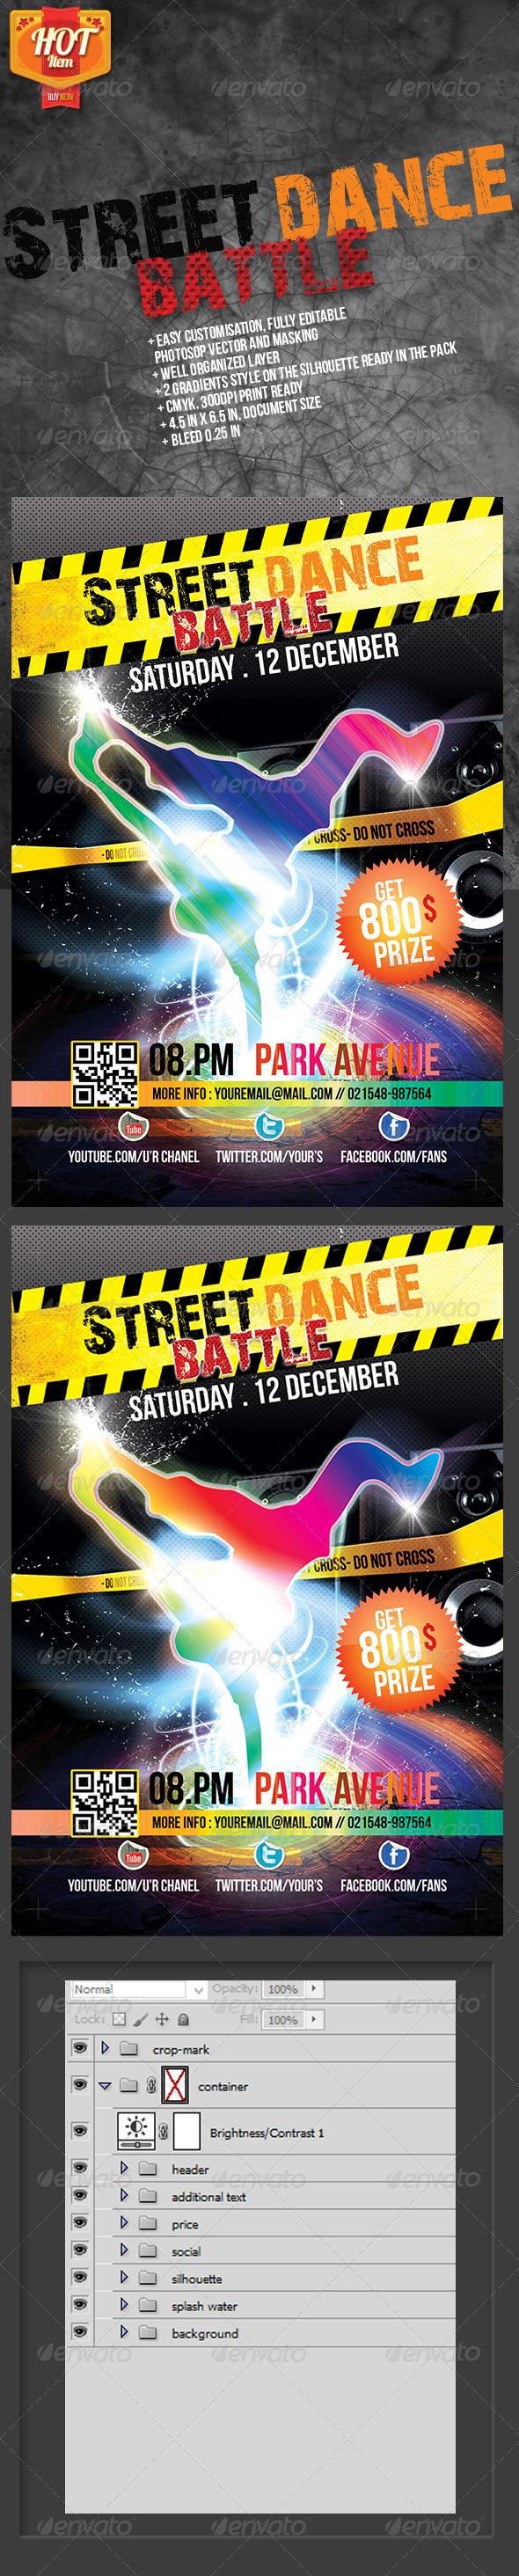 Street Dance Battle - Events Flyers